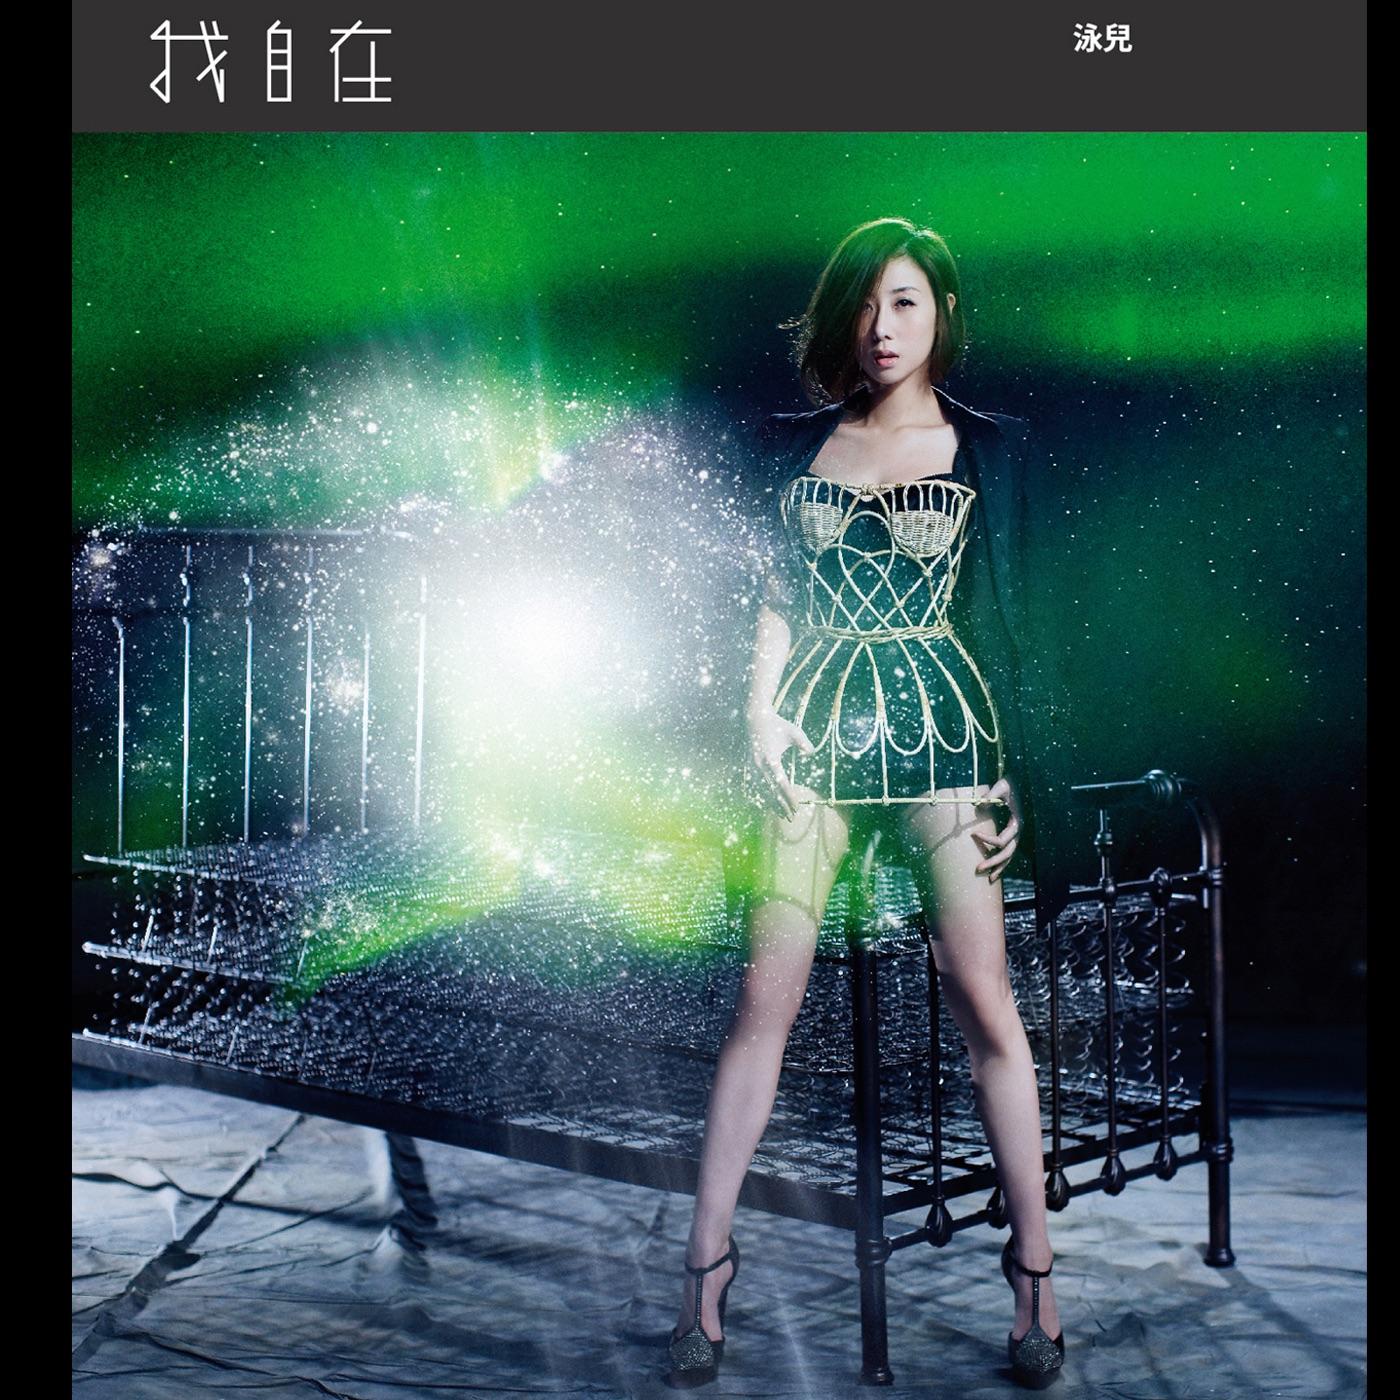 泳儿 - 我自在 (Deluxe Version)